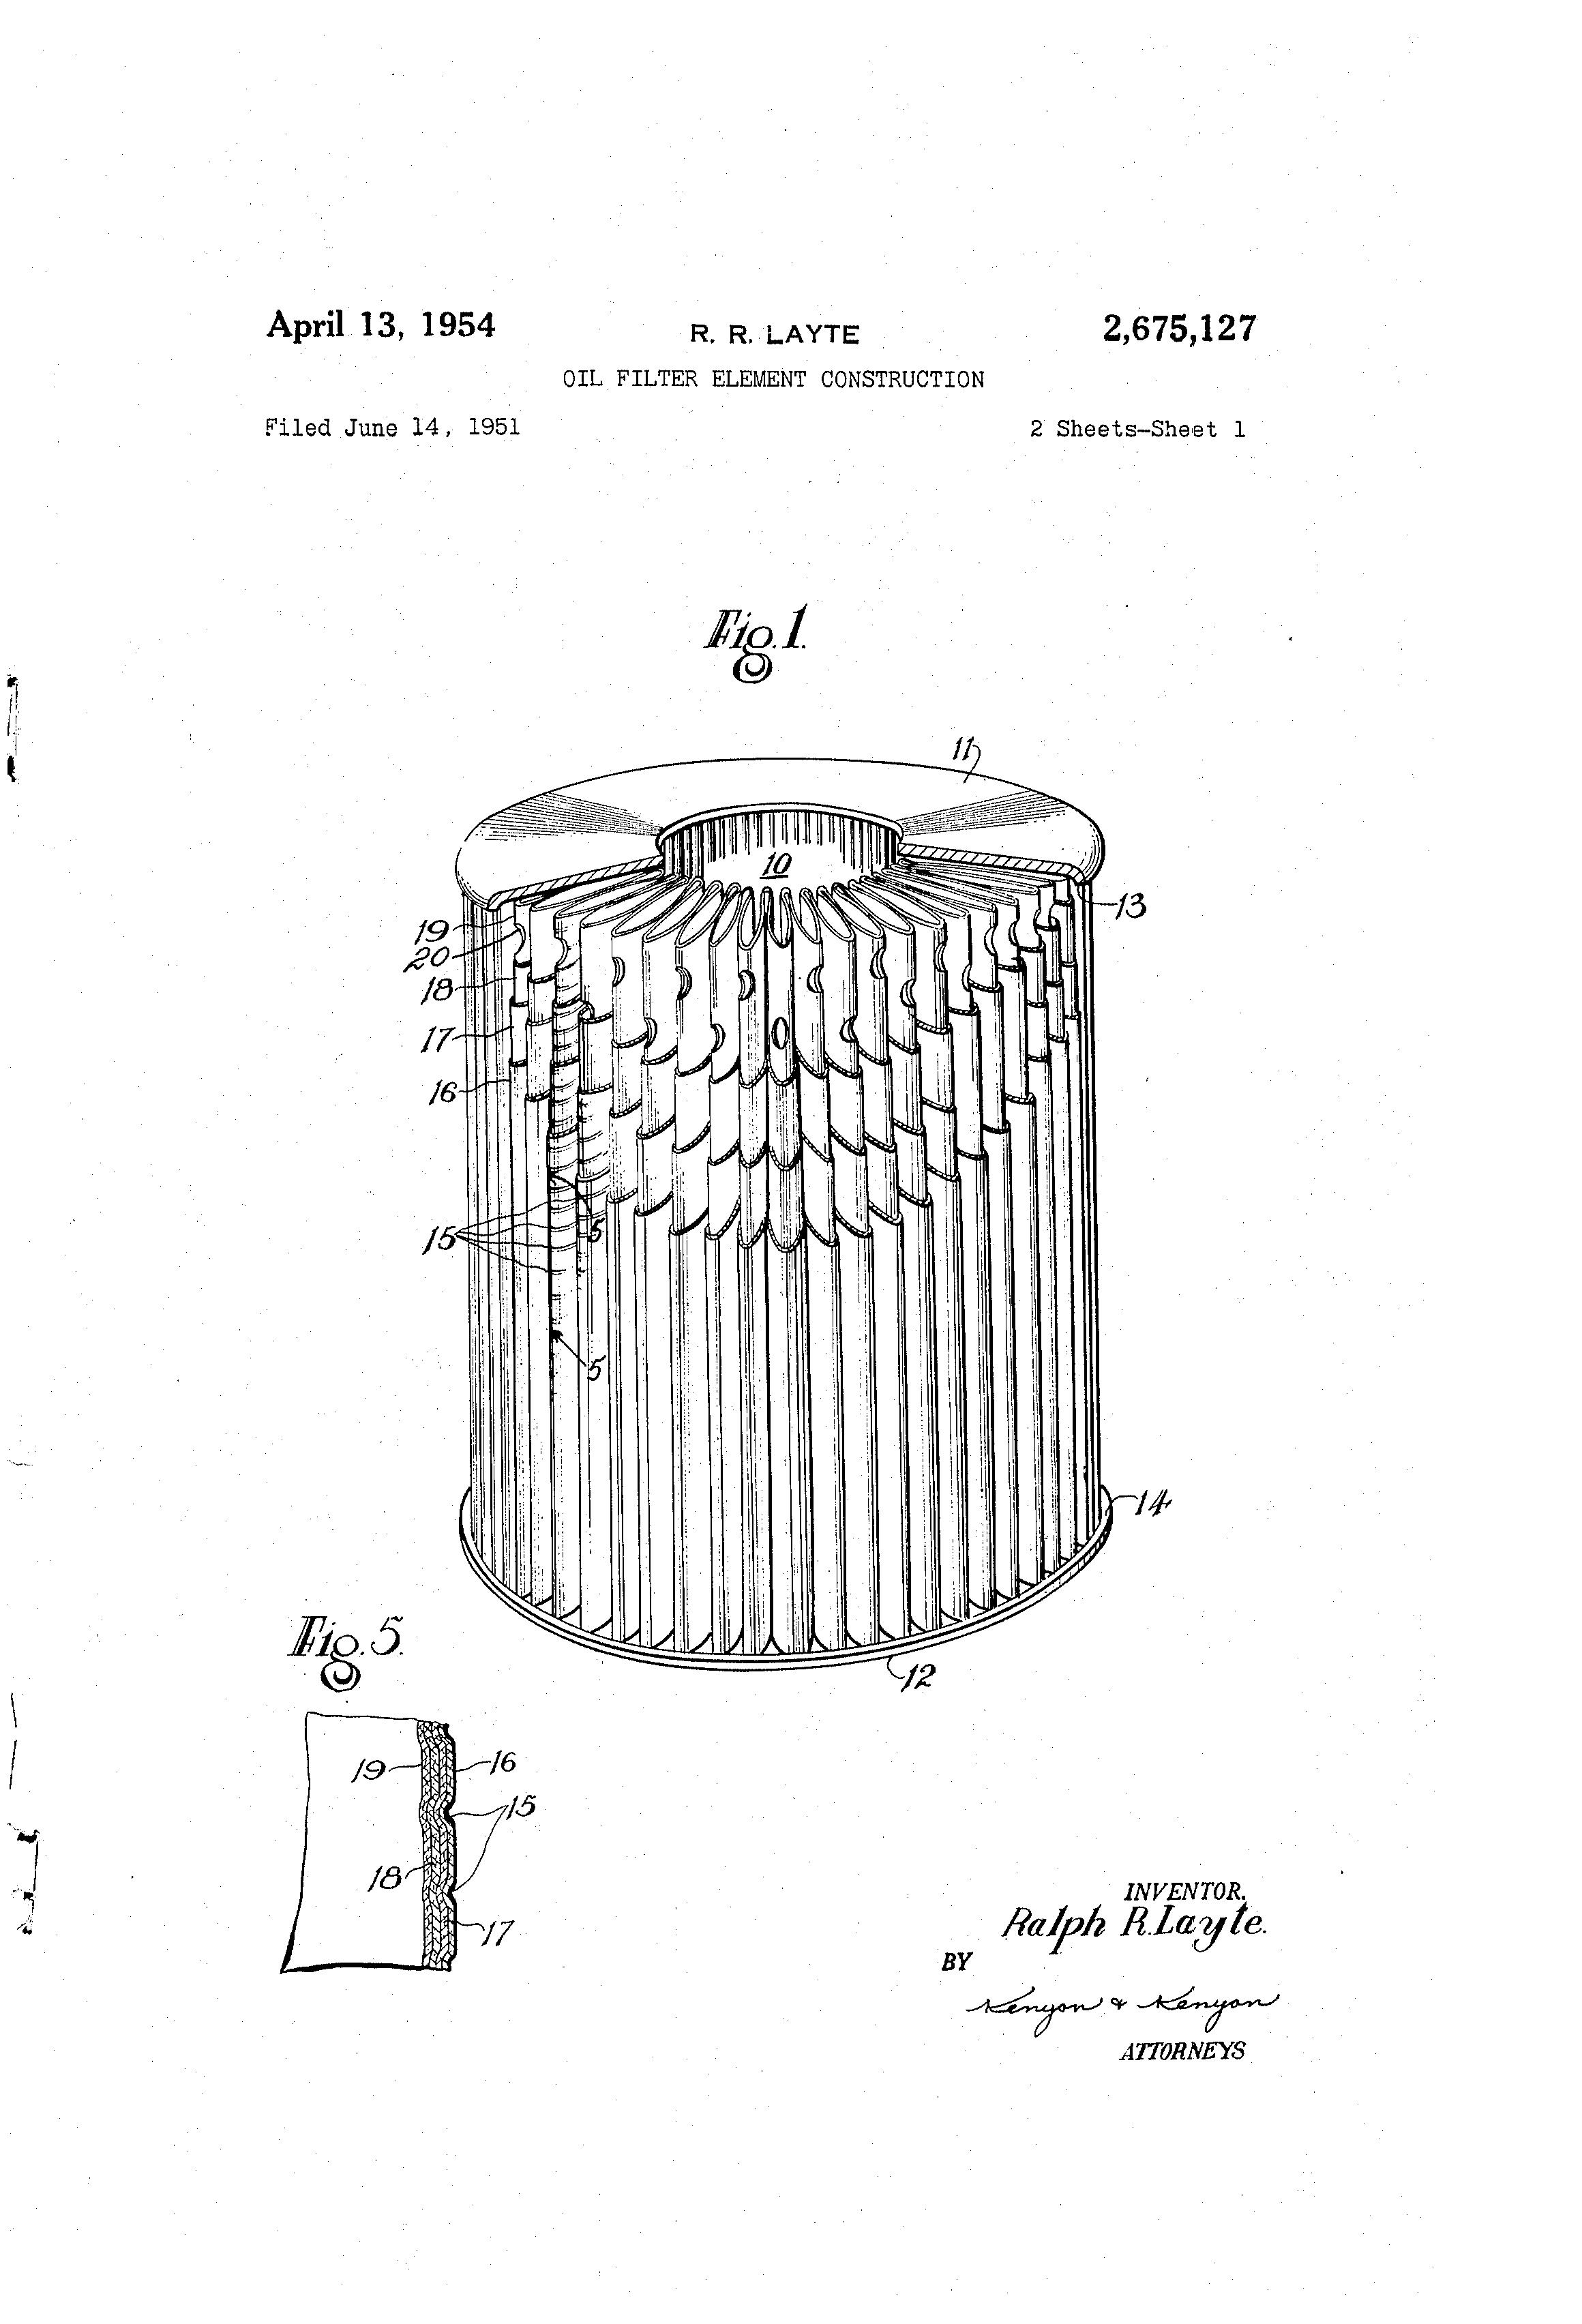 patent us2675127 - oil filter element construction